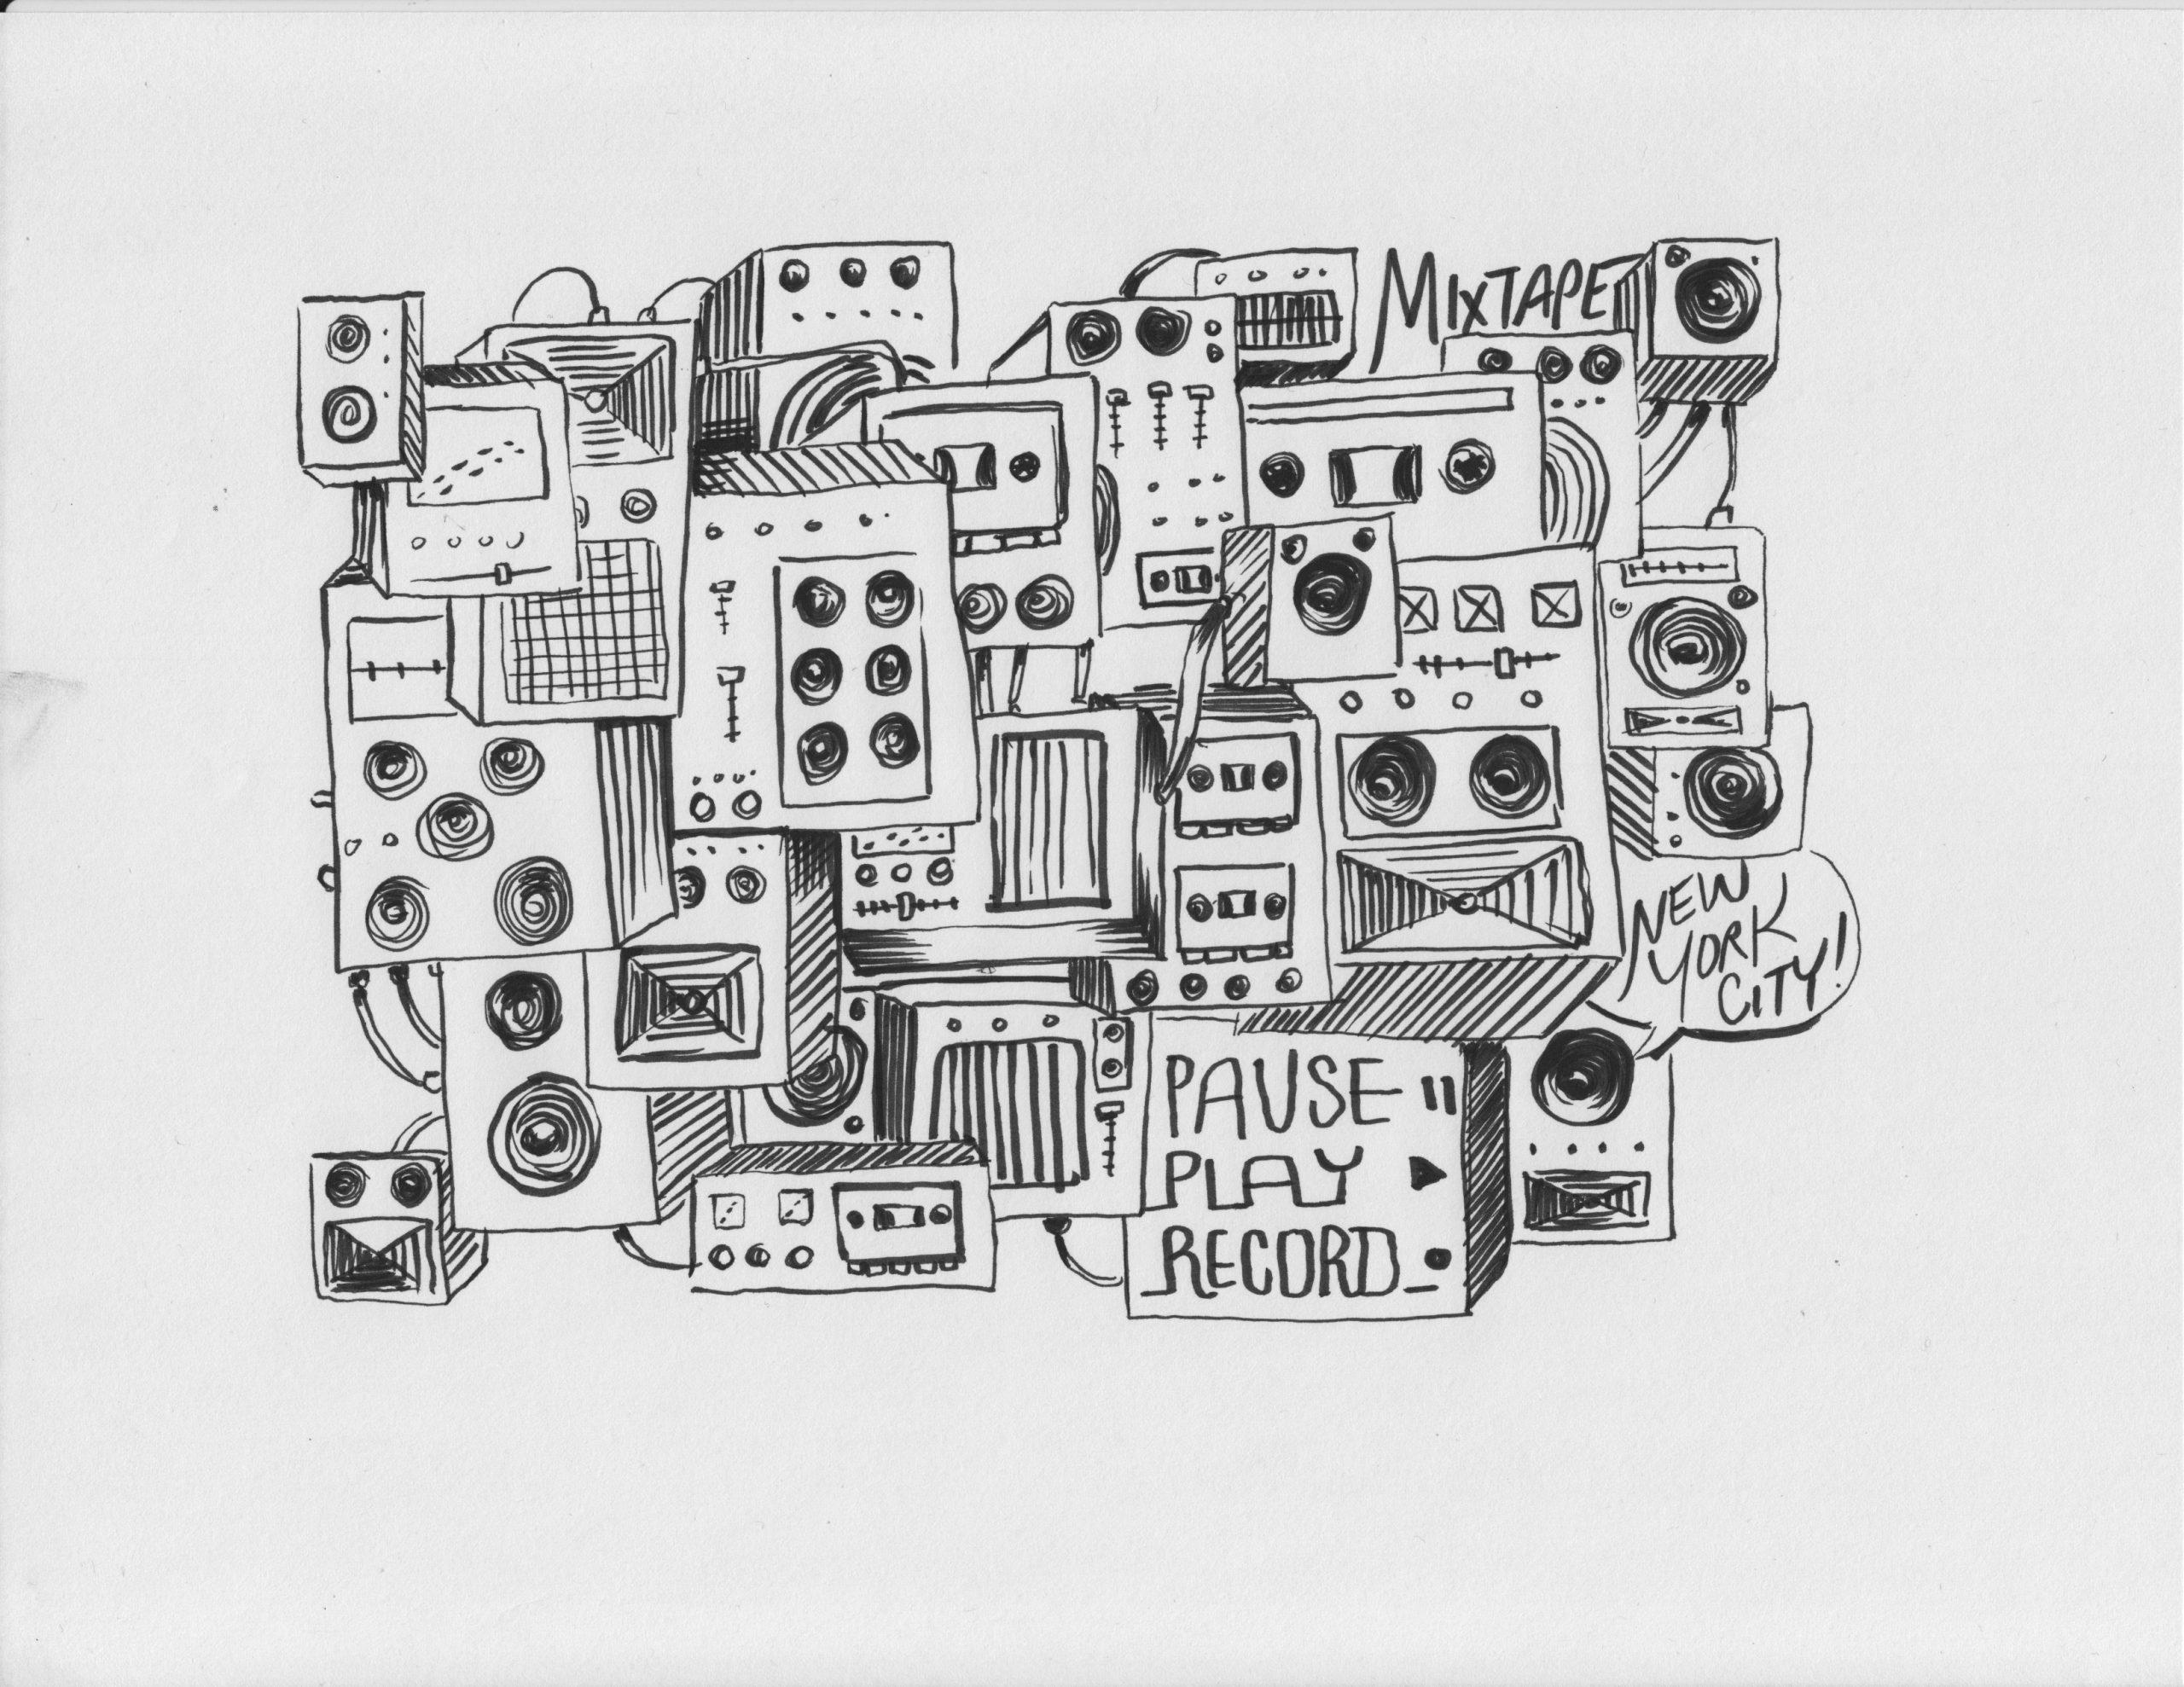 Mixtape - Artwork